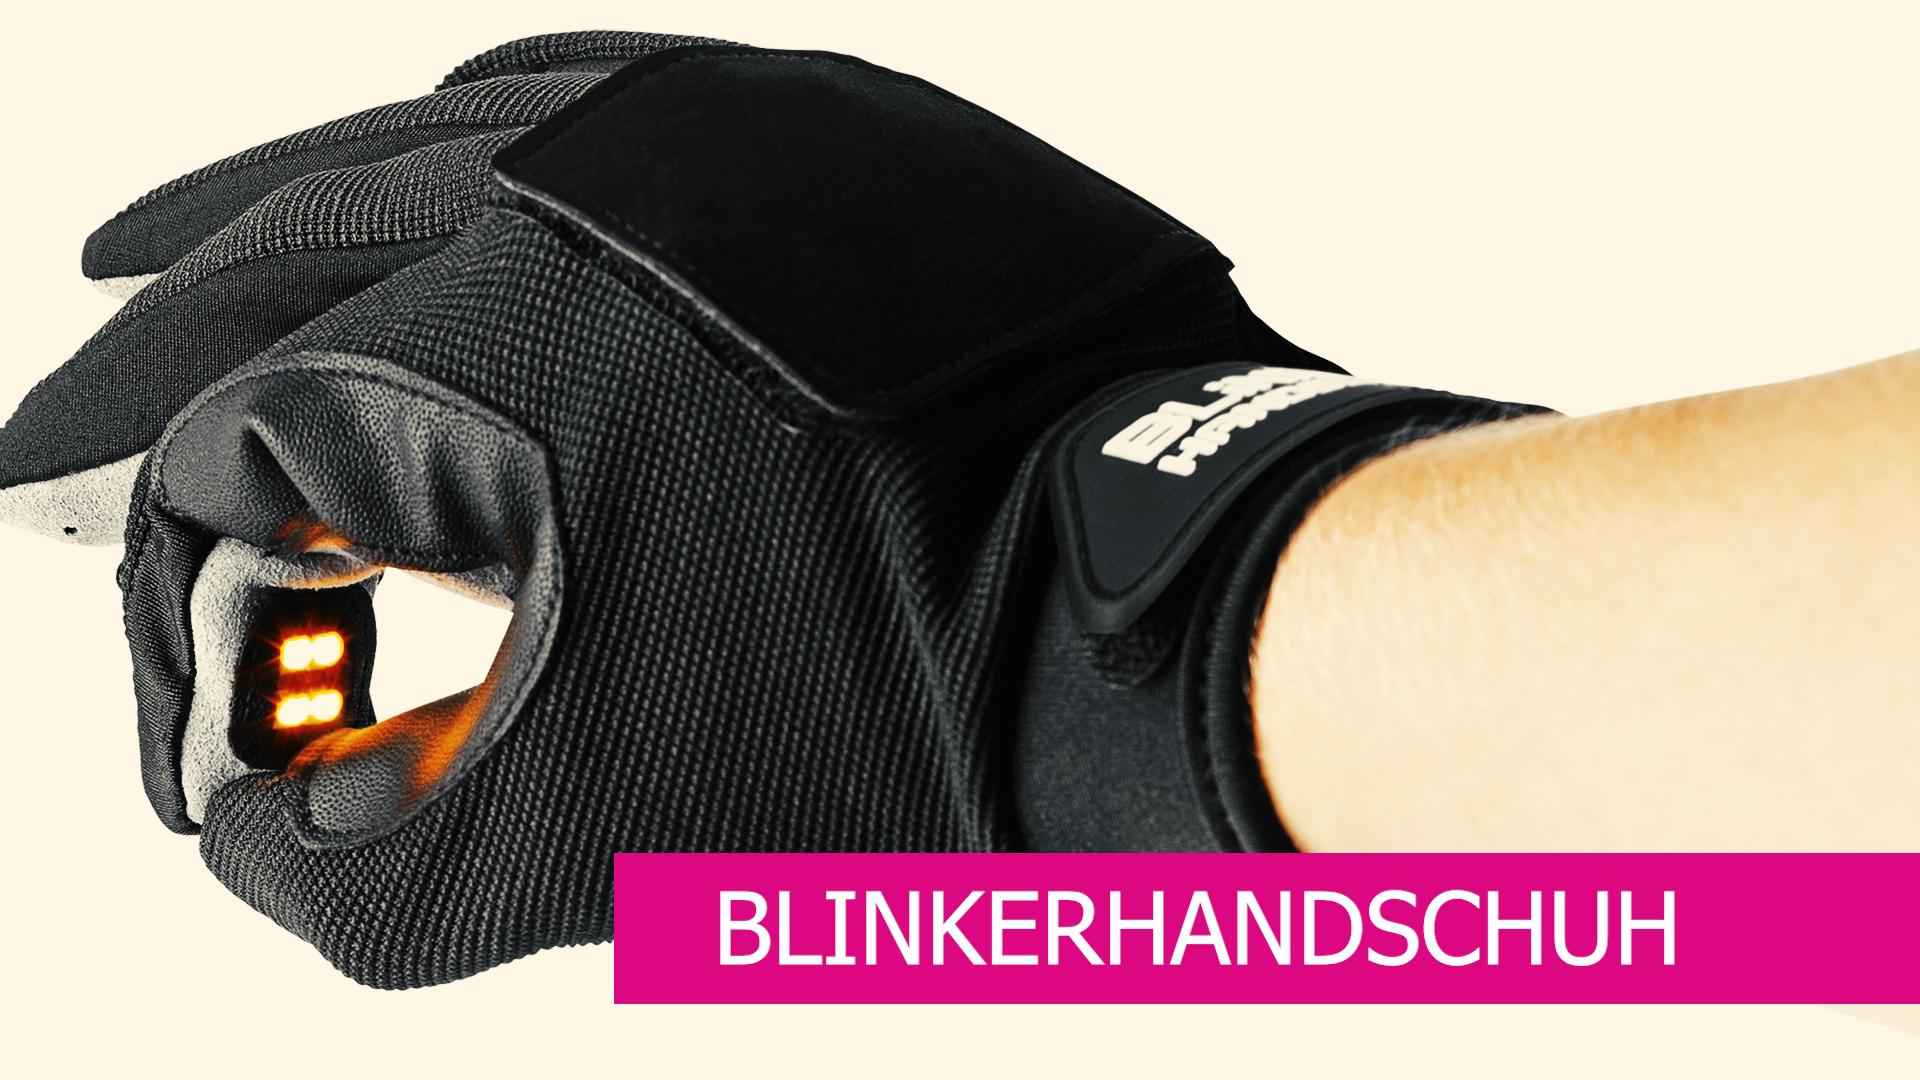 die 3 innovatisten handschuh gadgets f r den winter. Black Bedroom Furniture Sets. Home Design Ideas